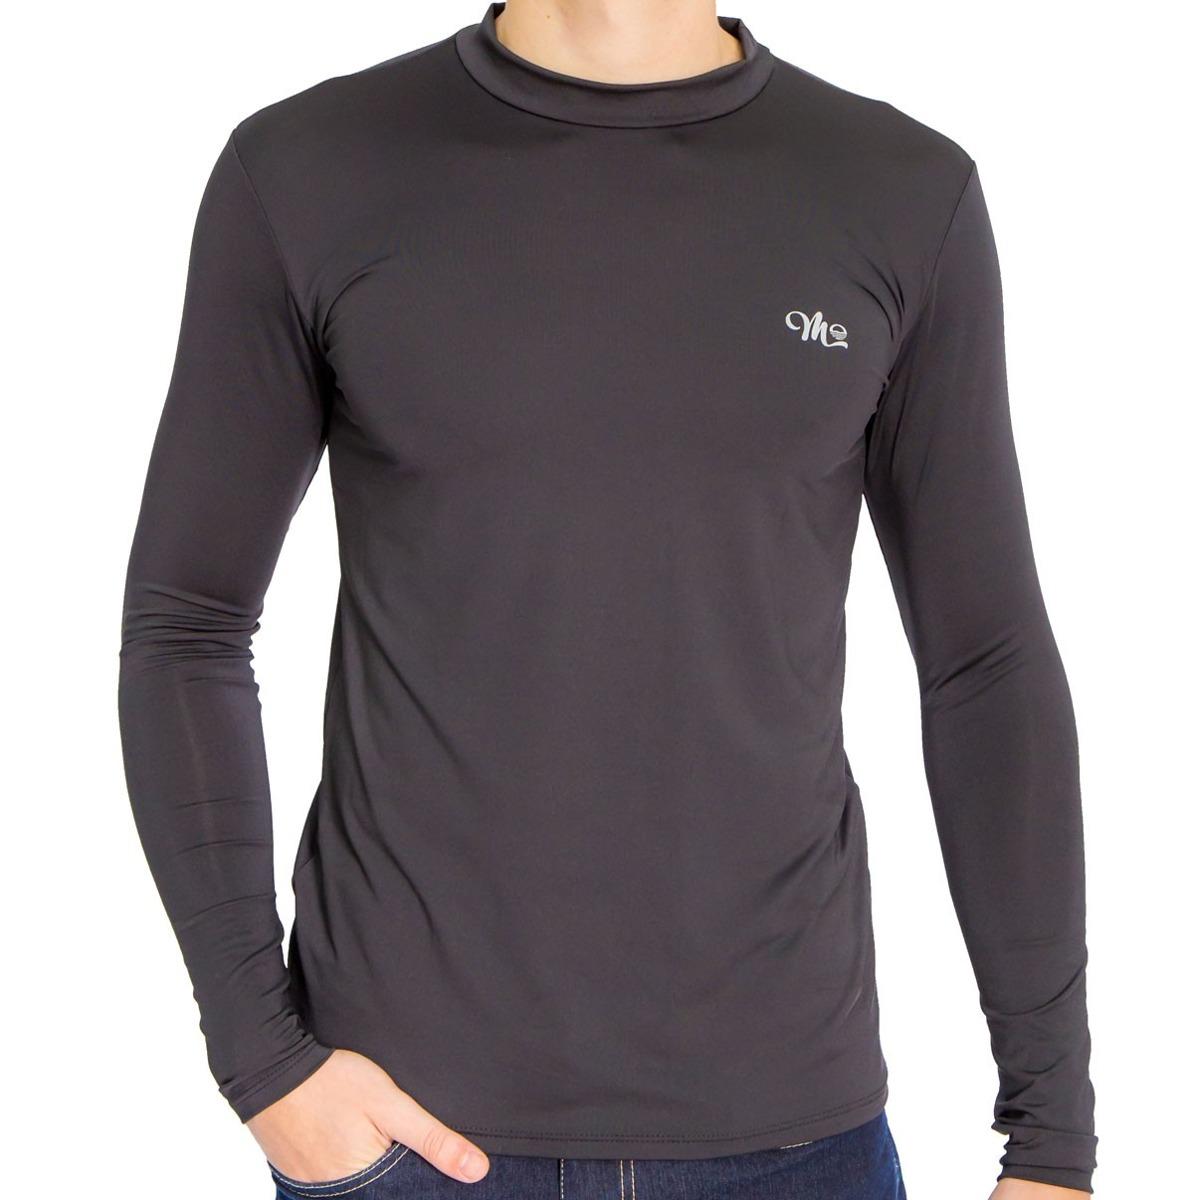 camiseta térmica segunda pele manga longa masculina mprotect. Carregando  zoom. b9be4a85109c4